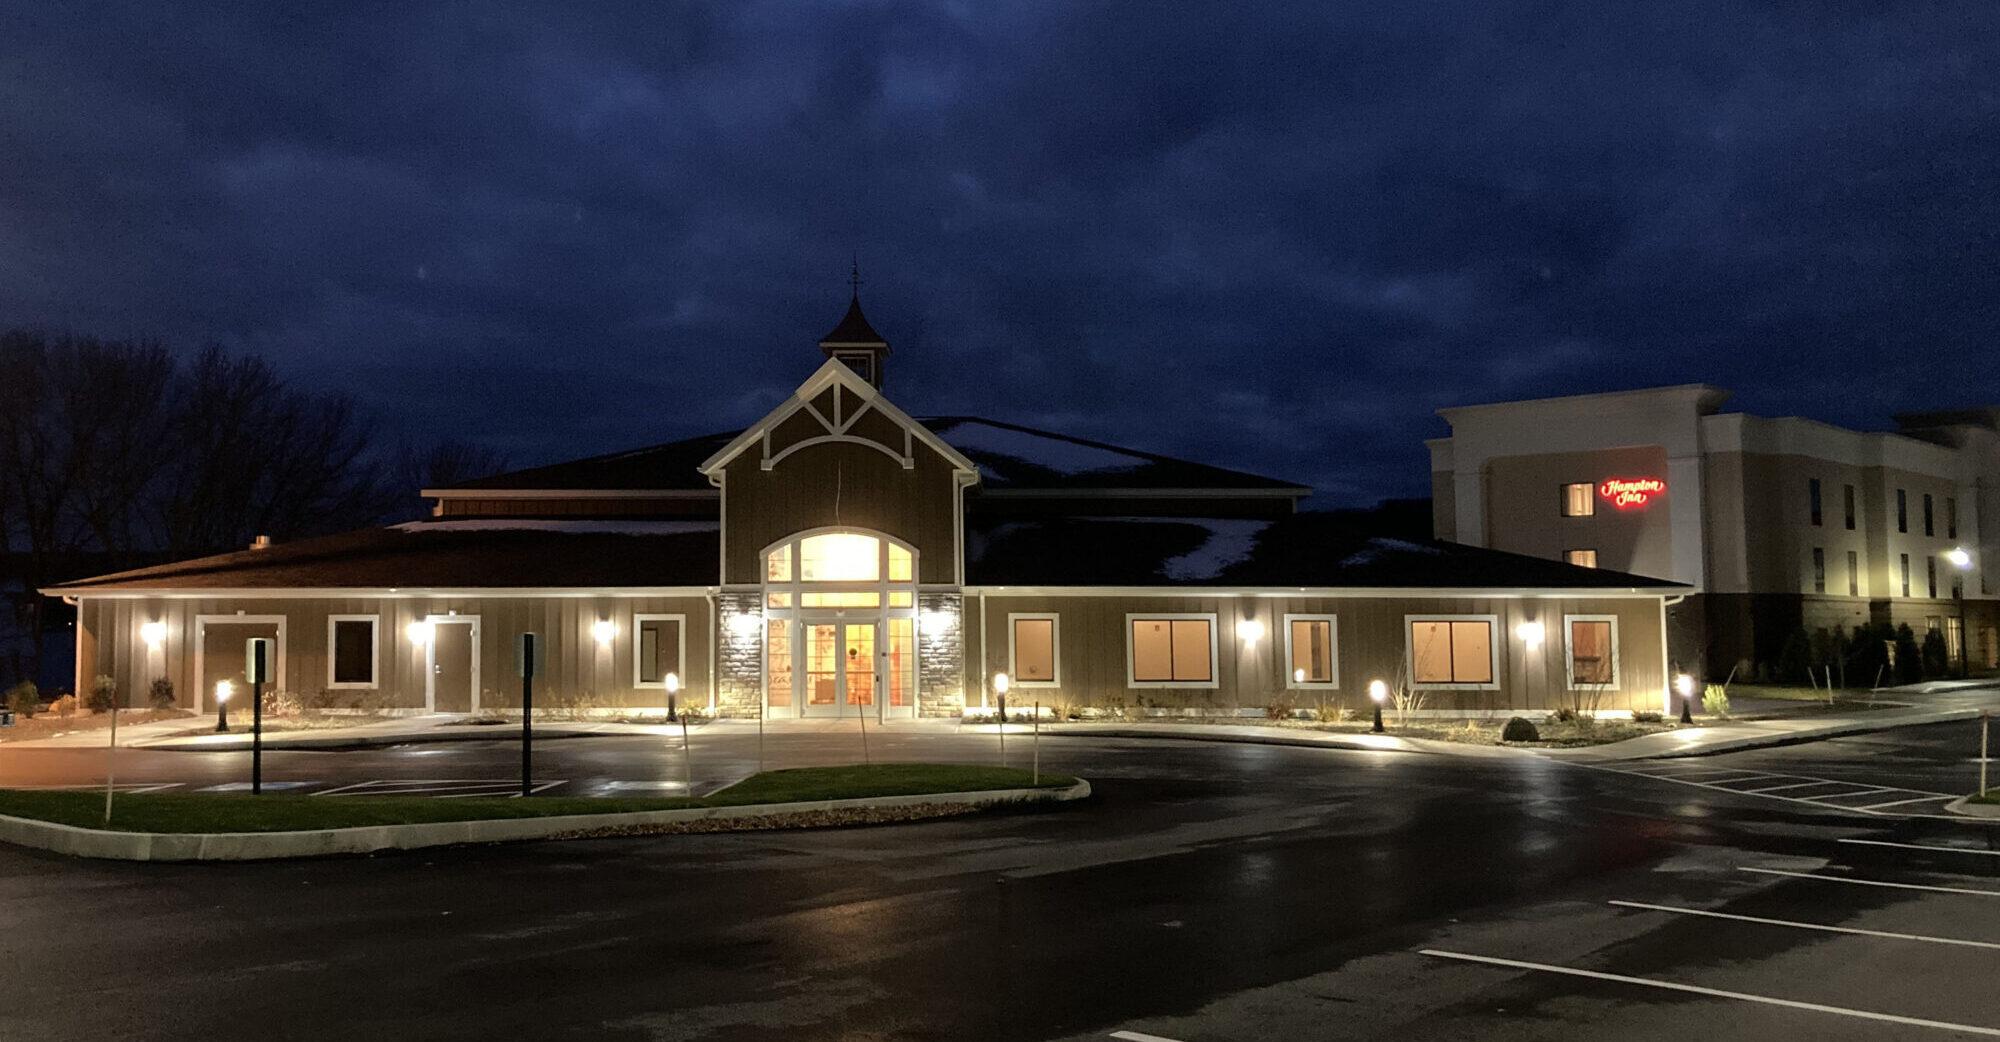 Seasons On Keuka Lake Banquet And Conference Center Night